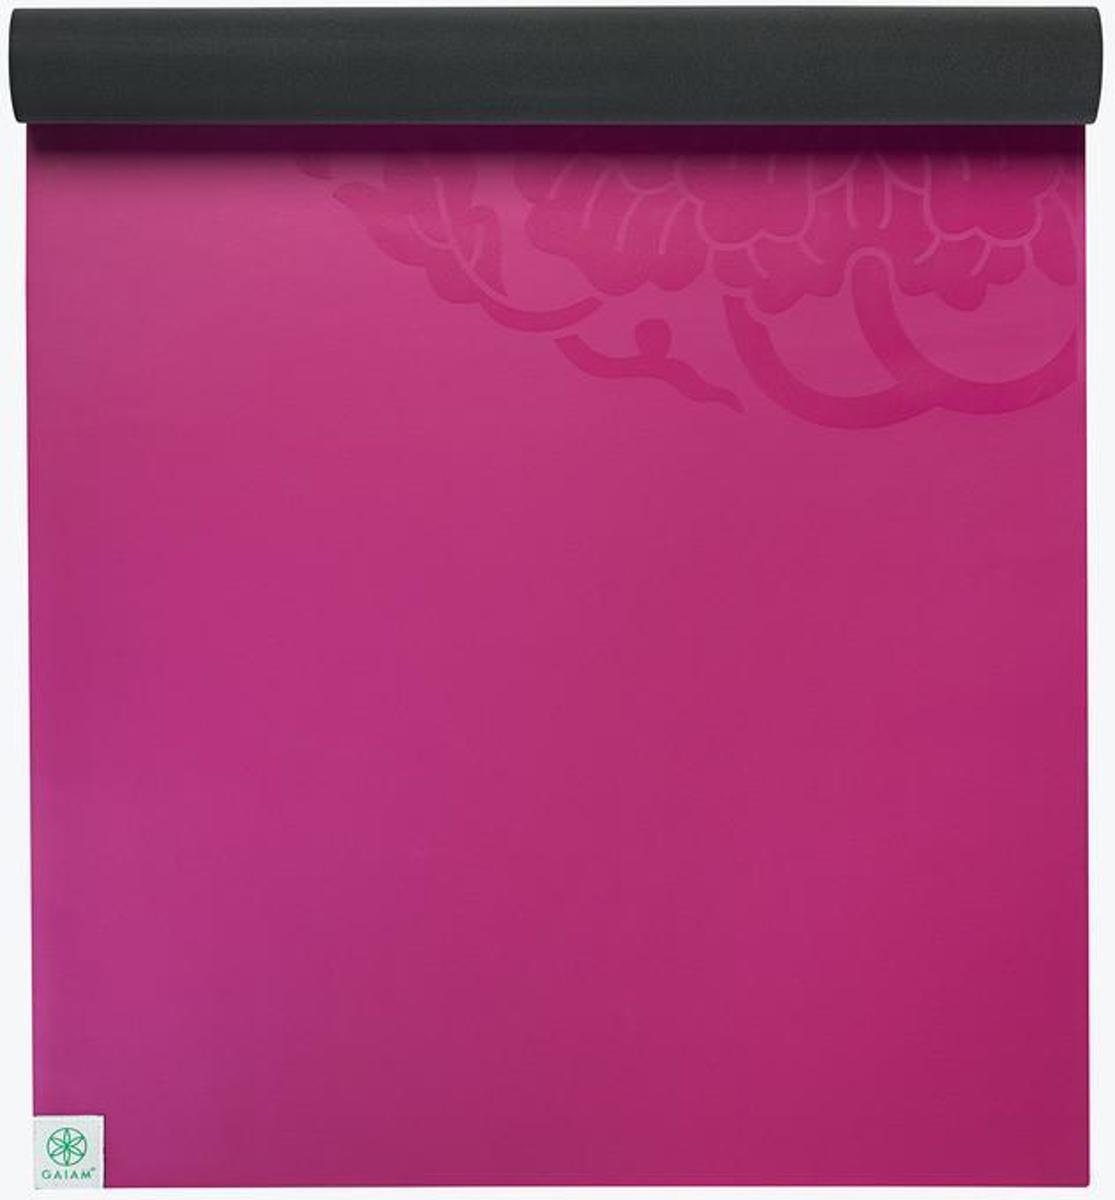 Gaiam Studio Select Dry Grip Reis - Yogamat - 2mm - Roze